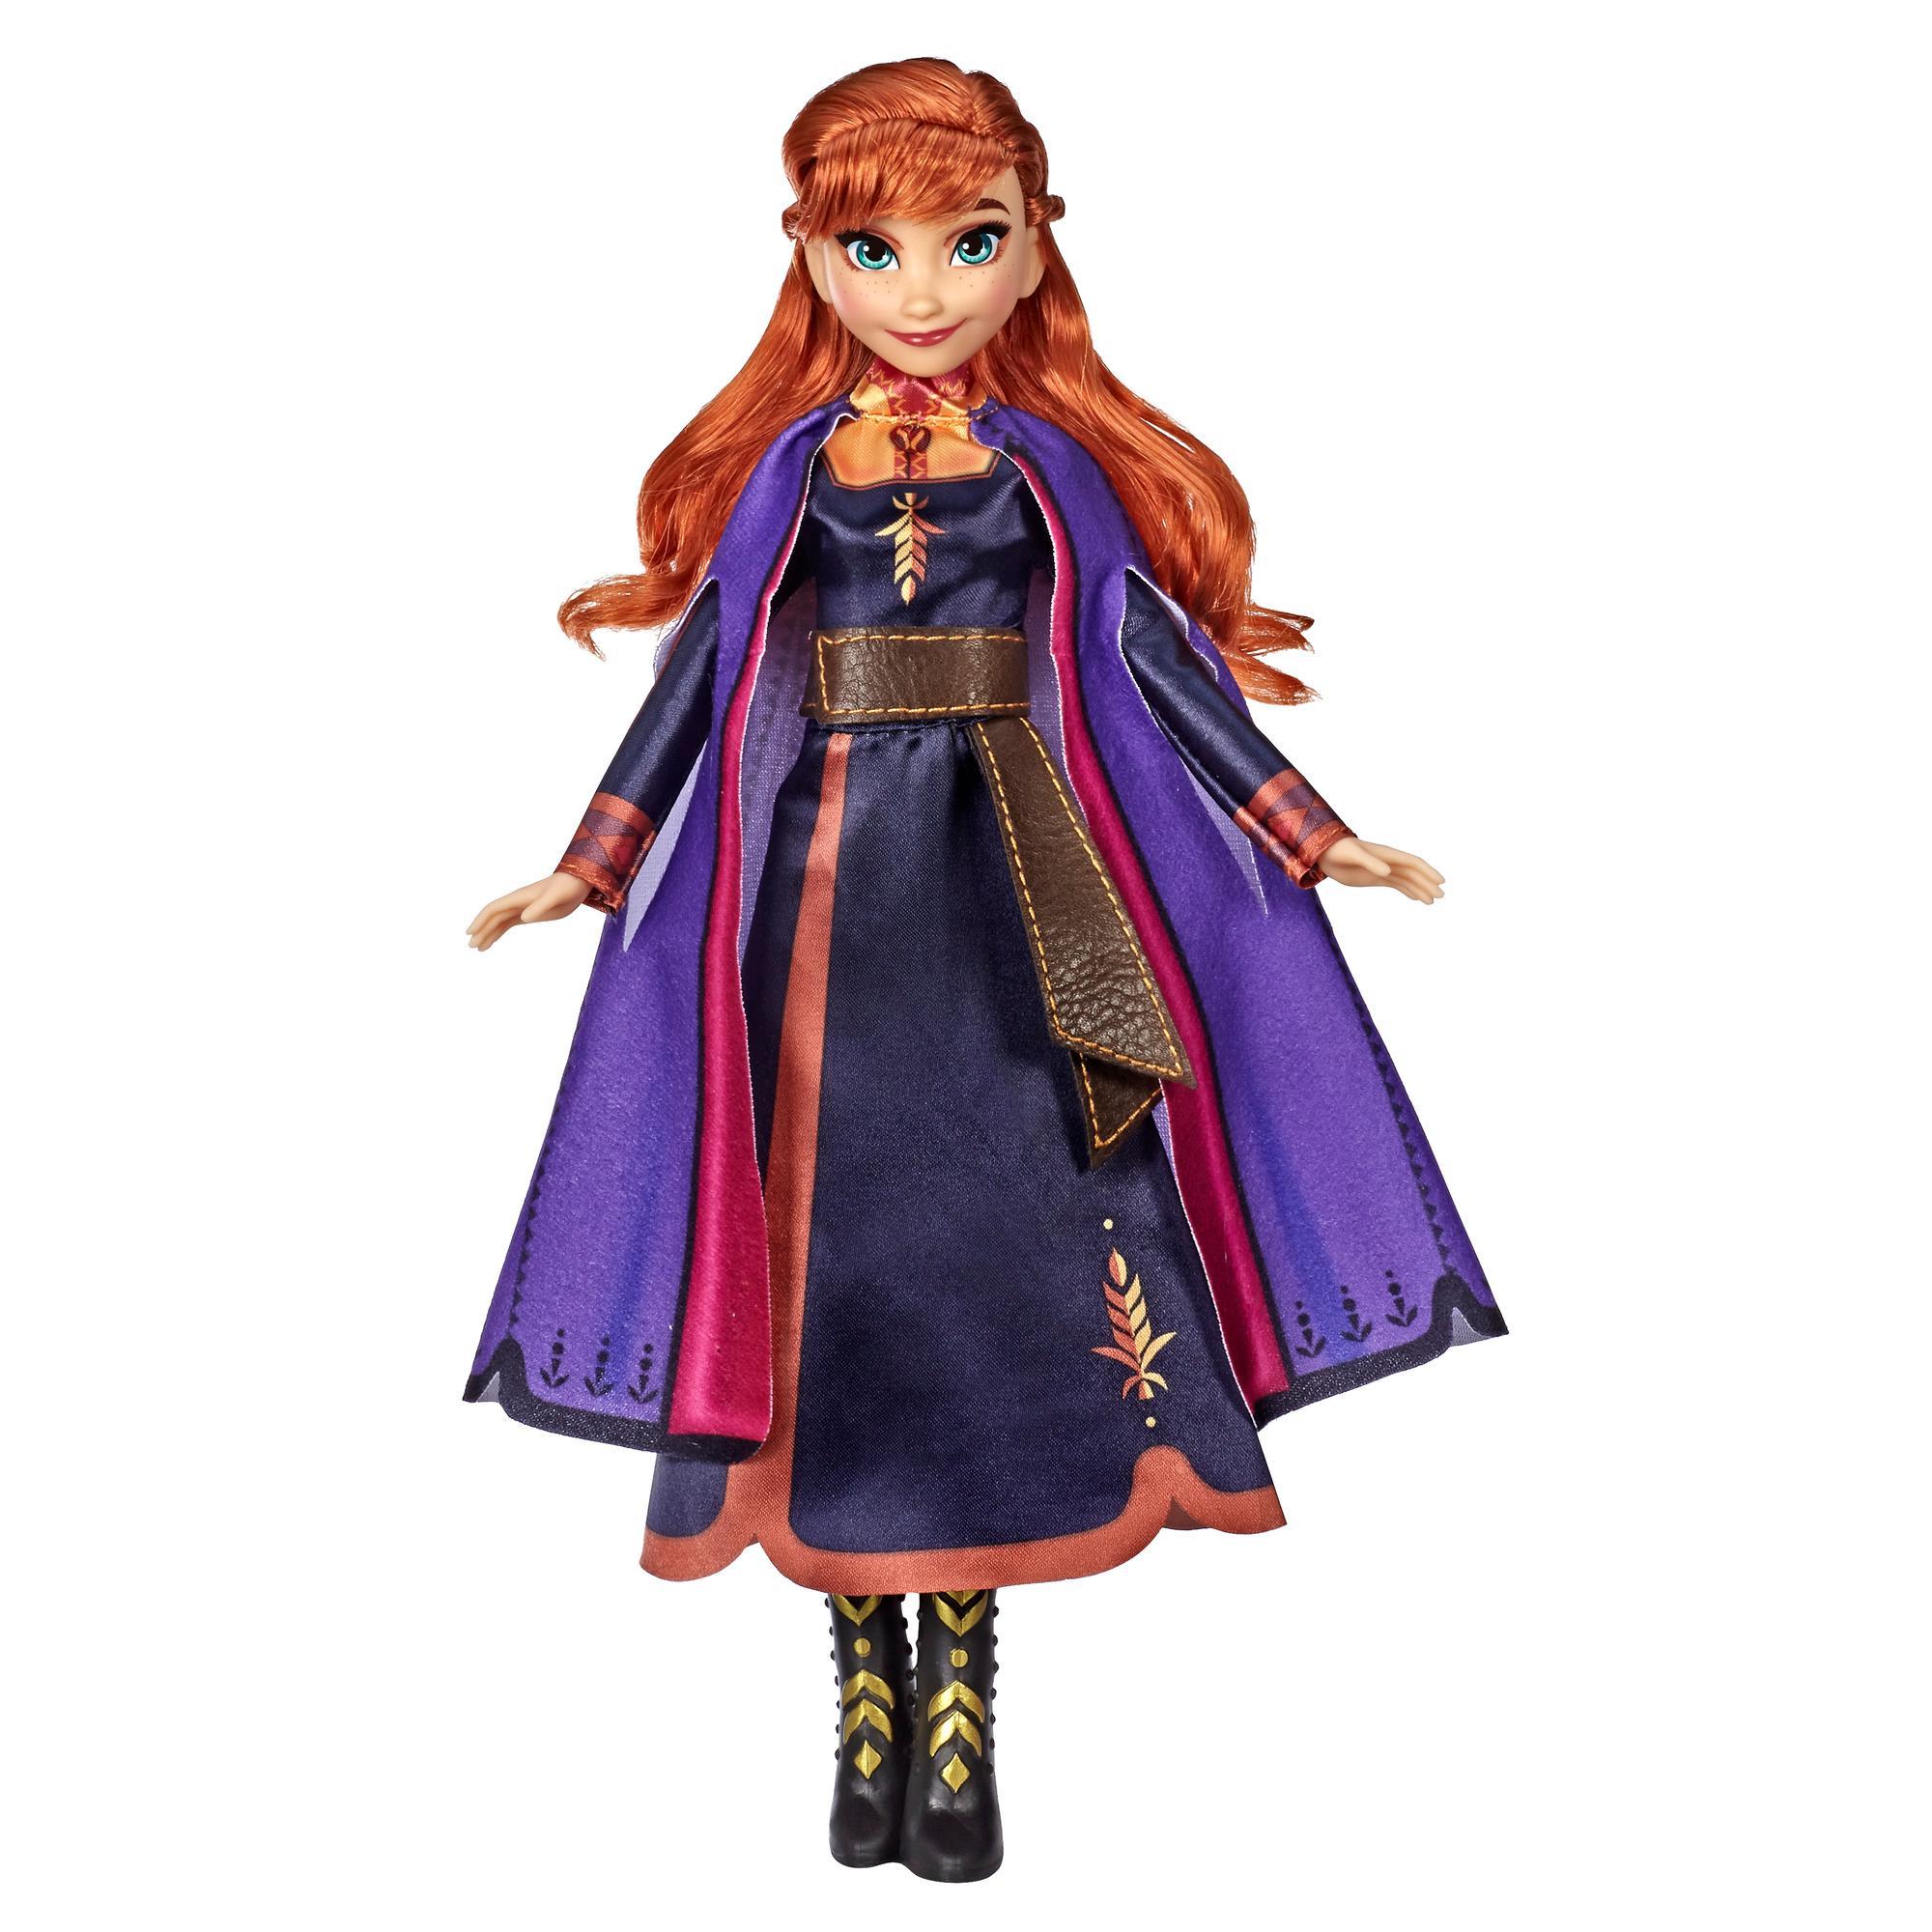 Disney Princess Frozen 2 Singing Fashion Doll - Anna